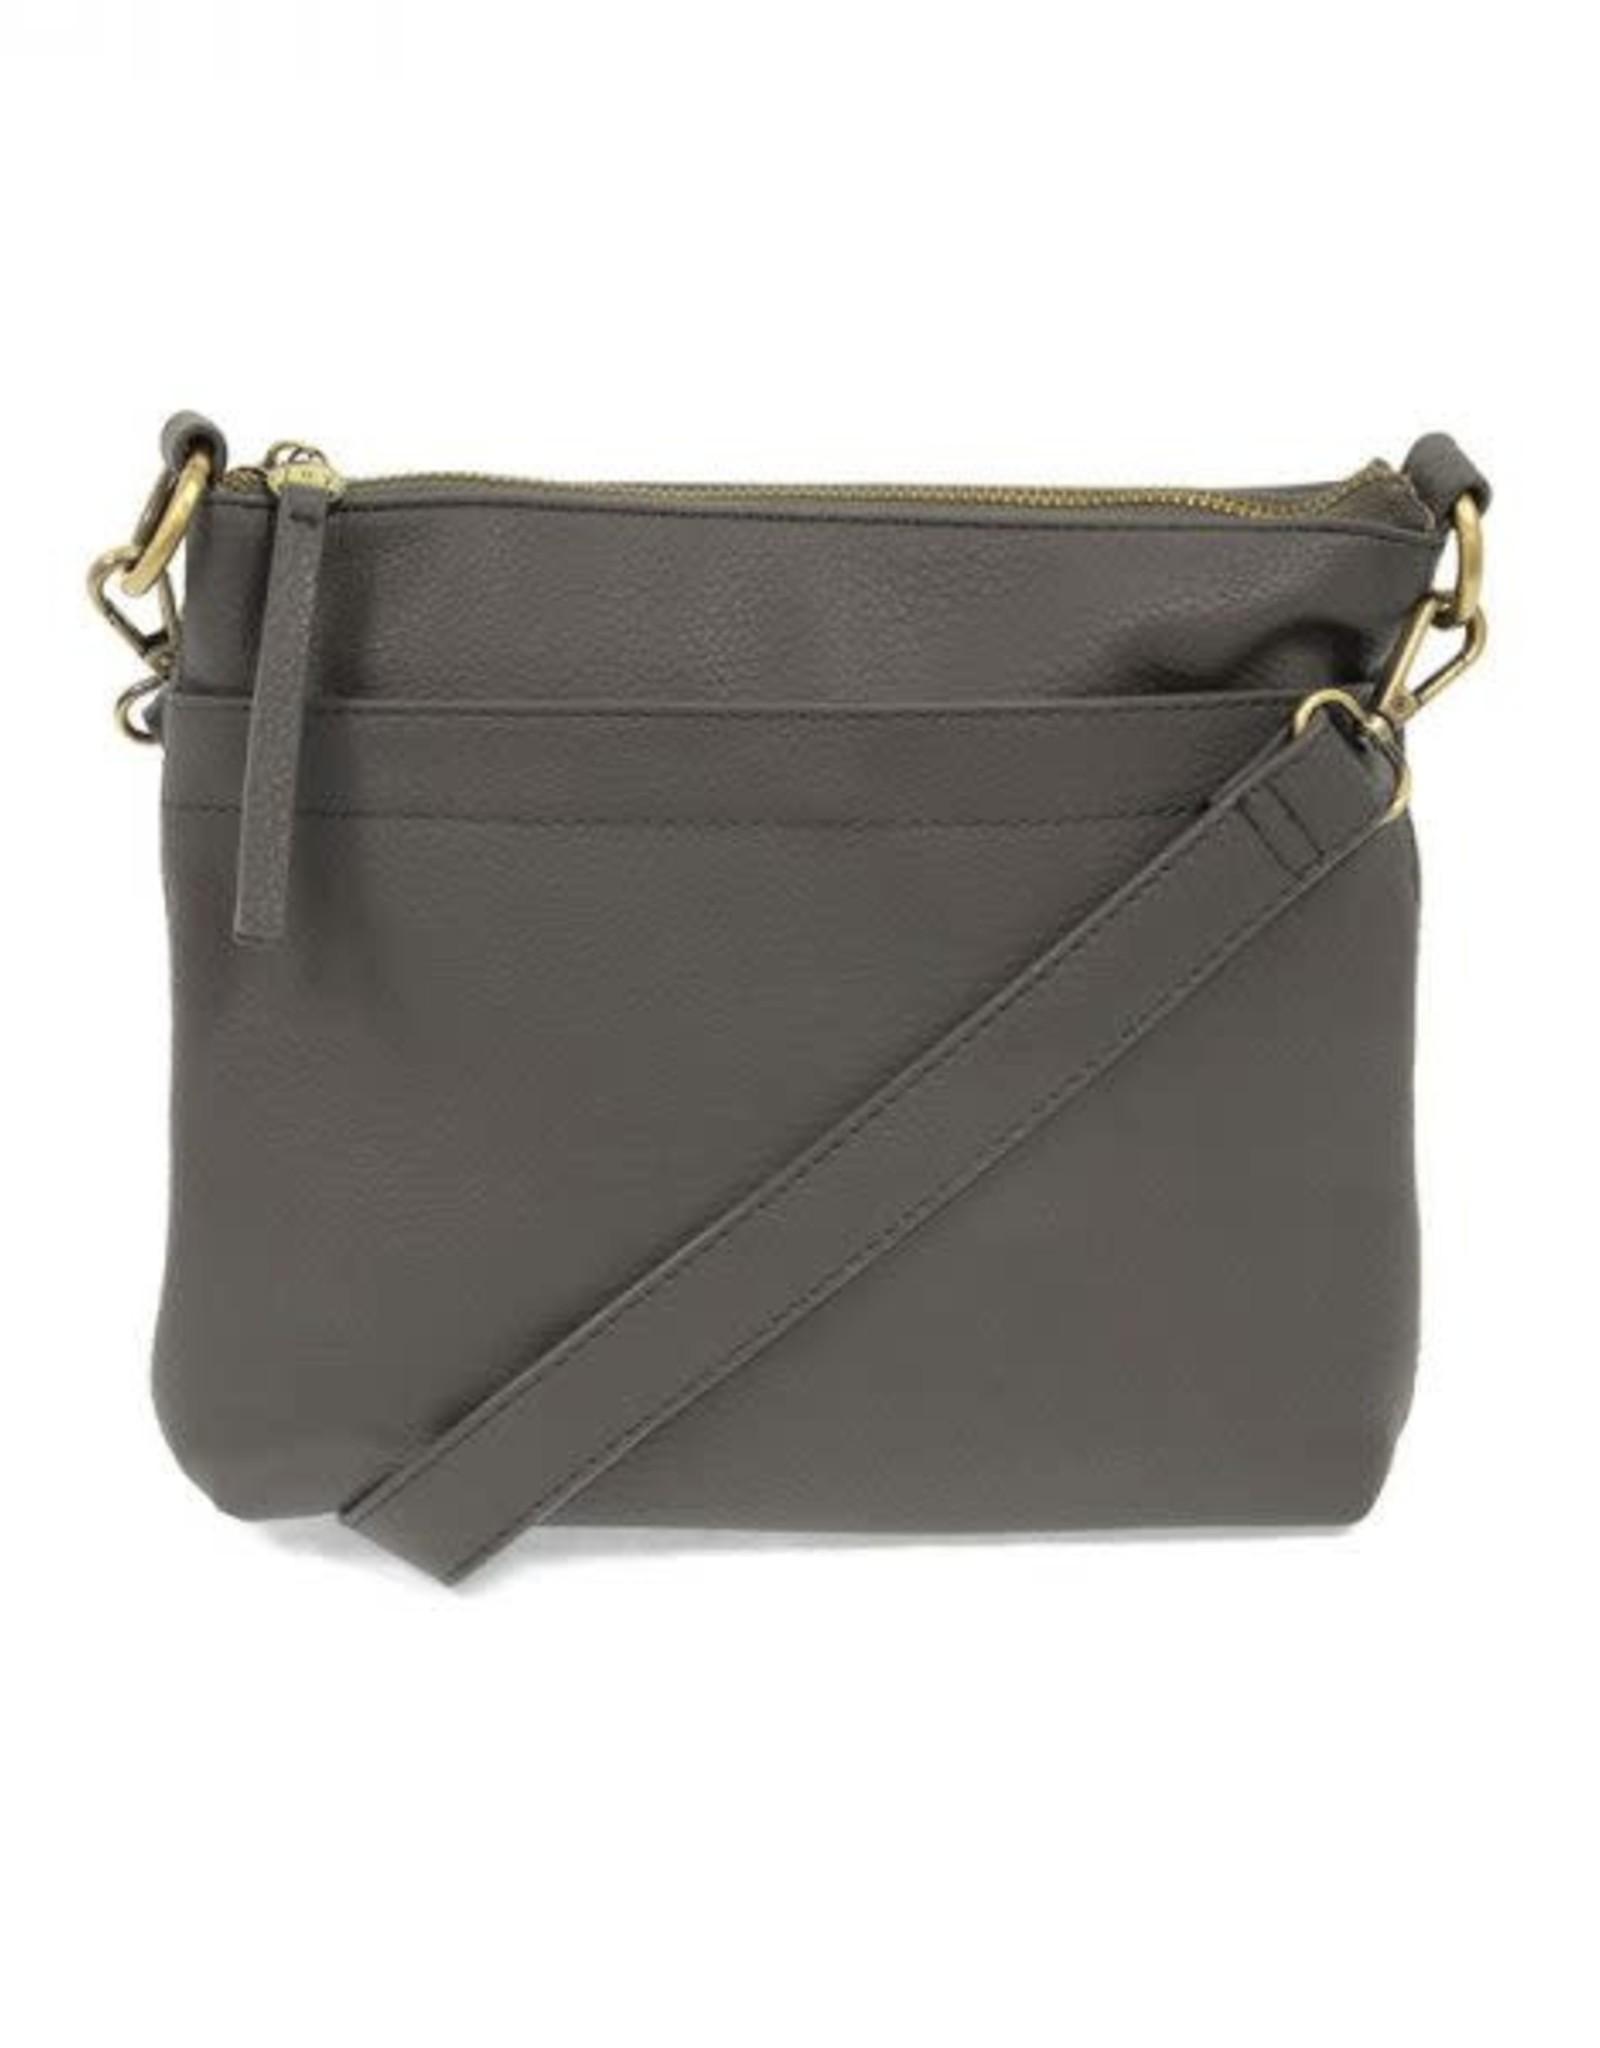 Charcoal Layla Top Zip Crossbody Bag